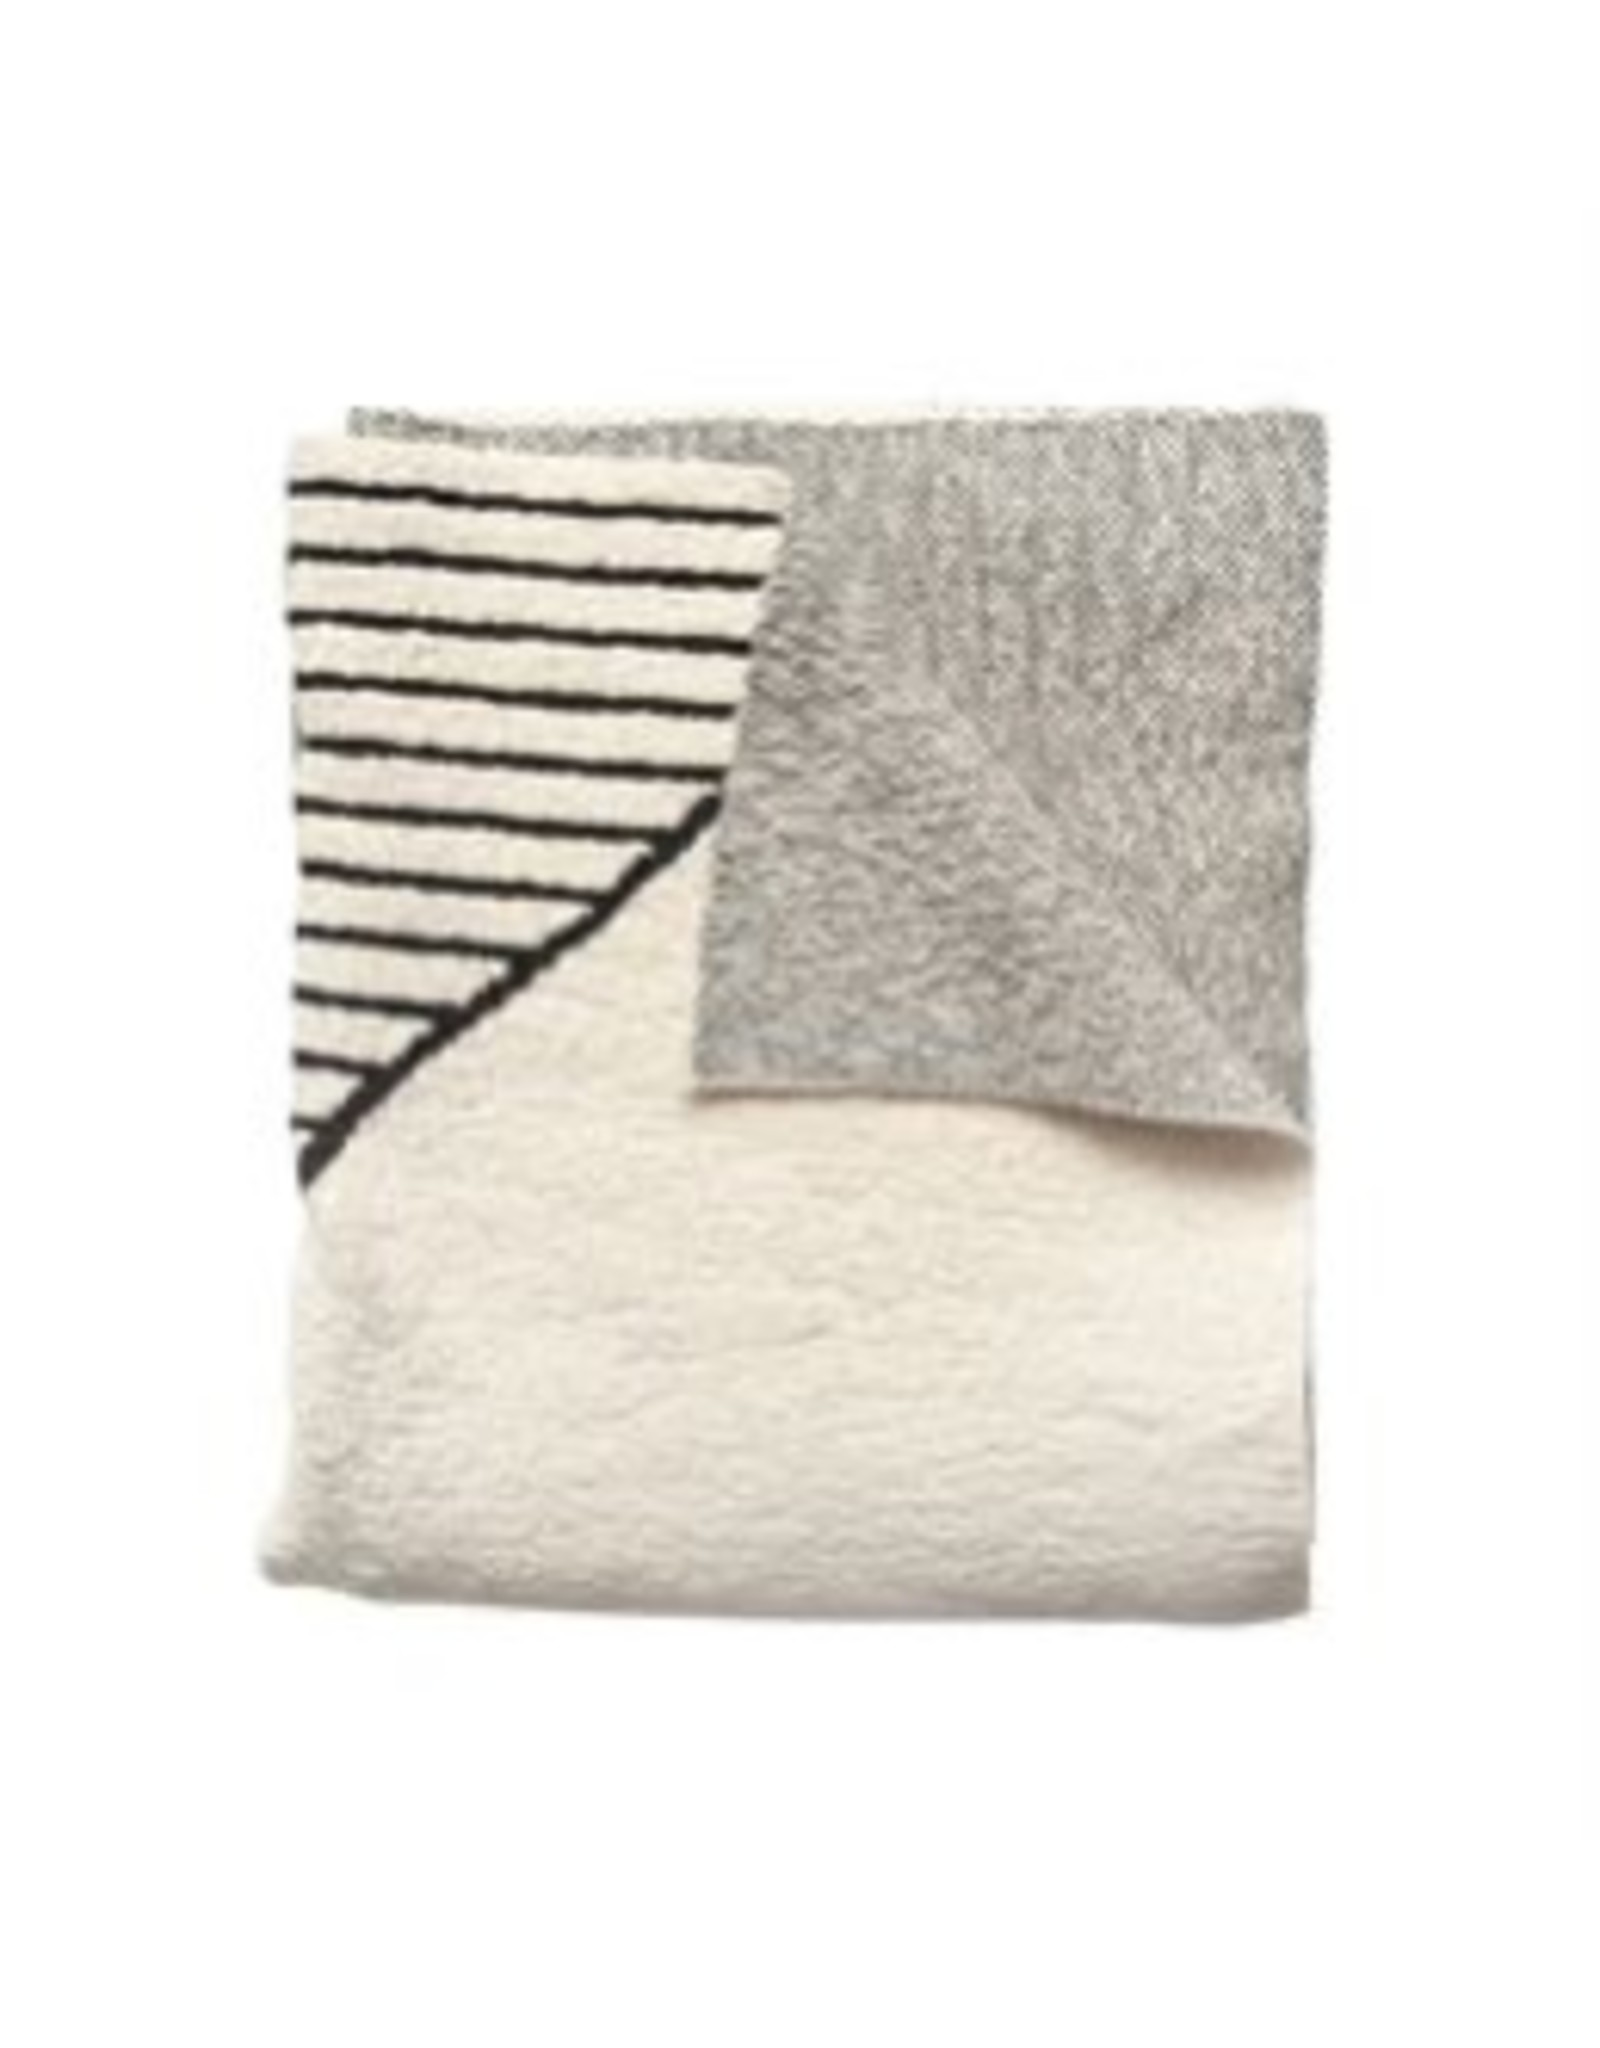 Bloomingville Cotton Knit Throw w/ Pattern, Cream & Black